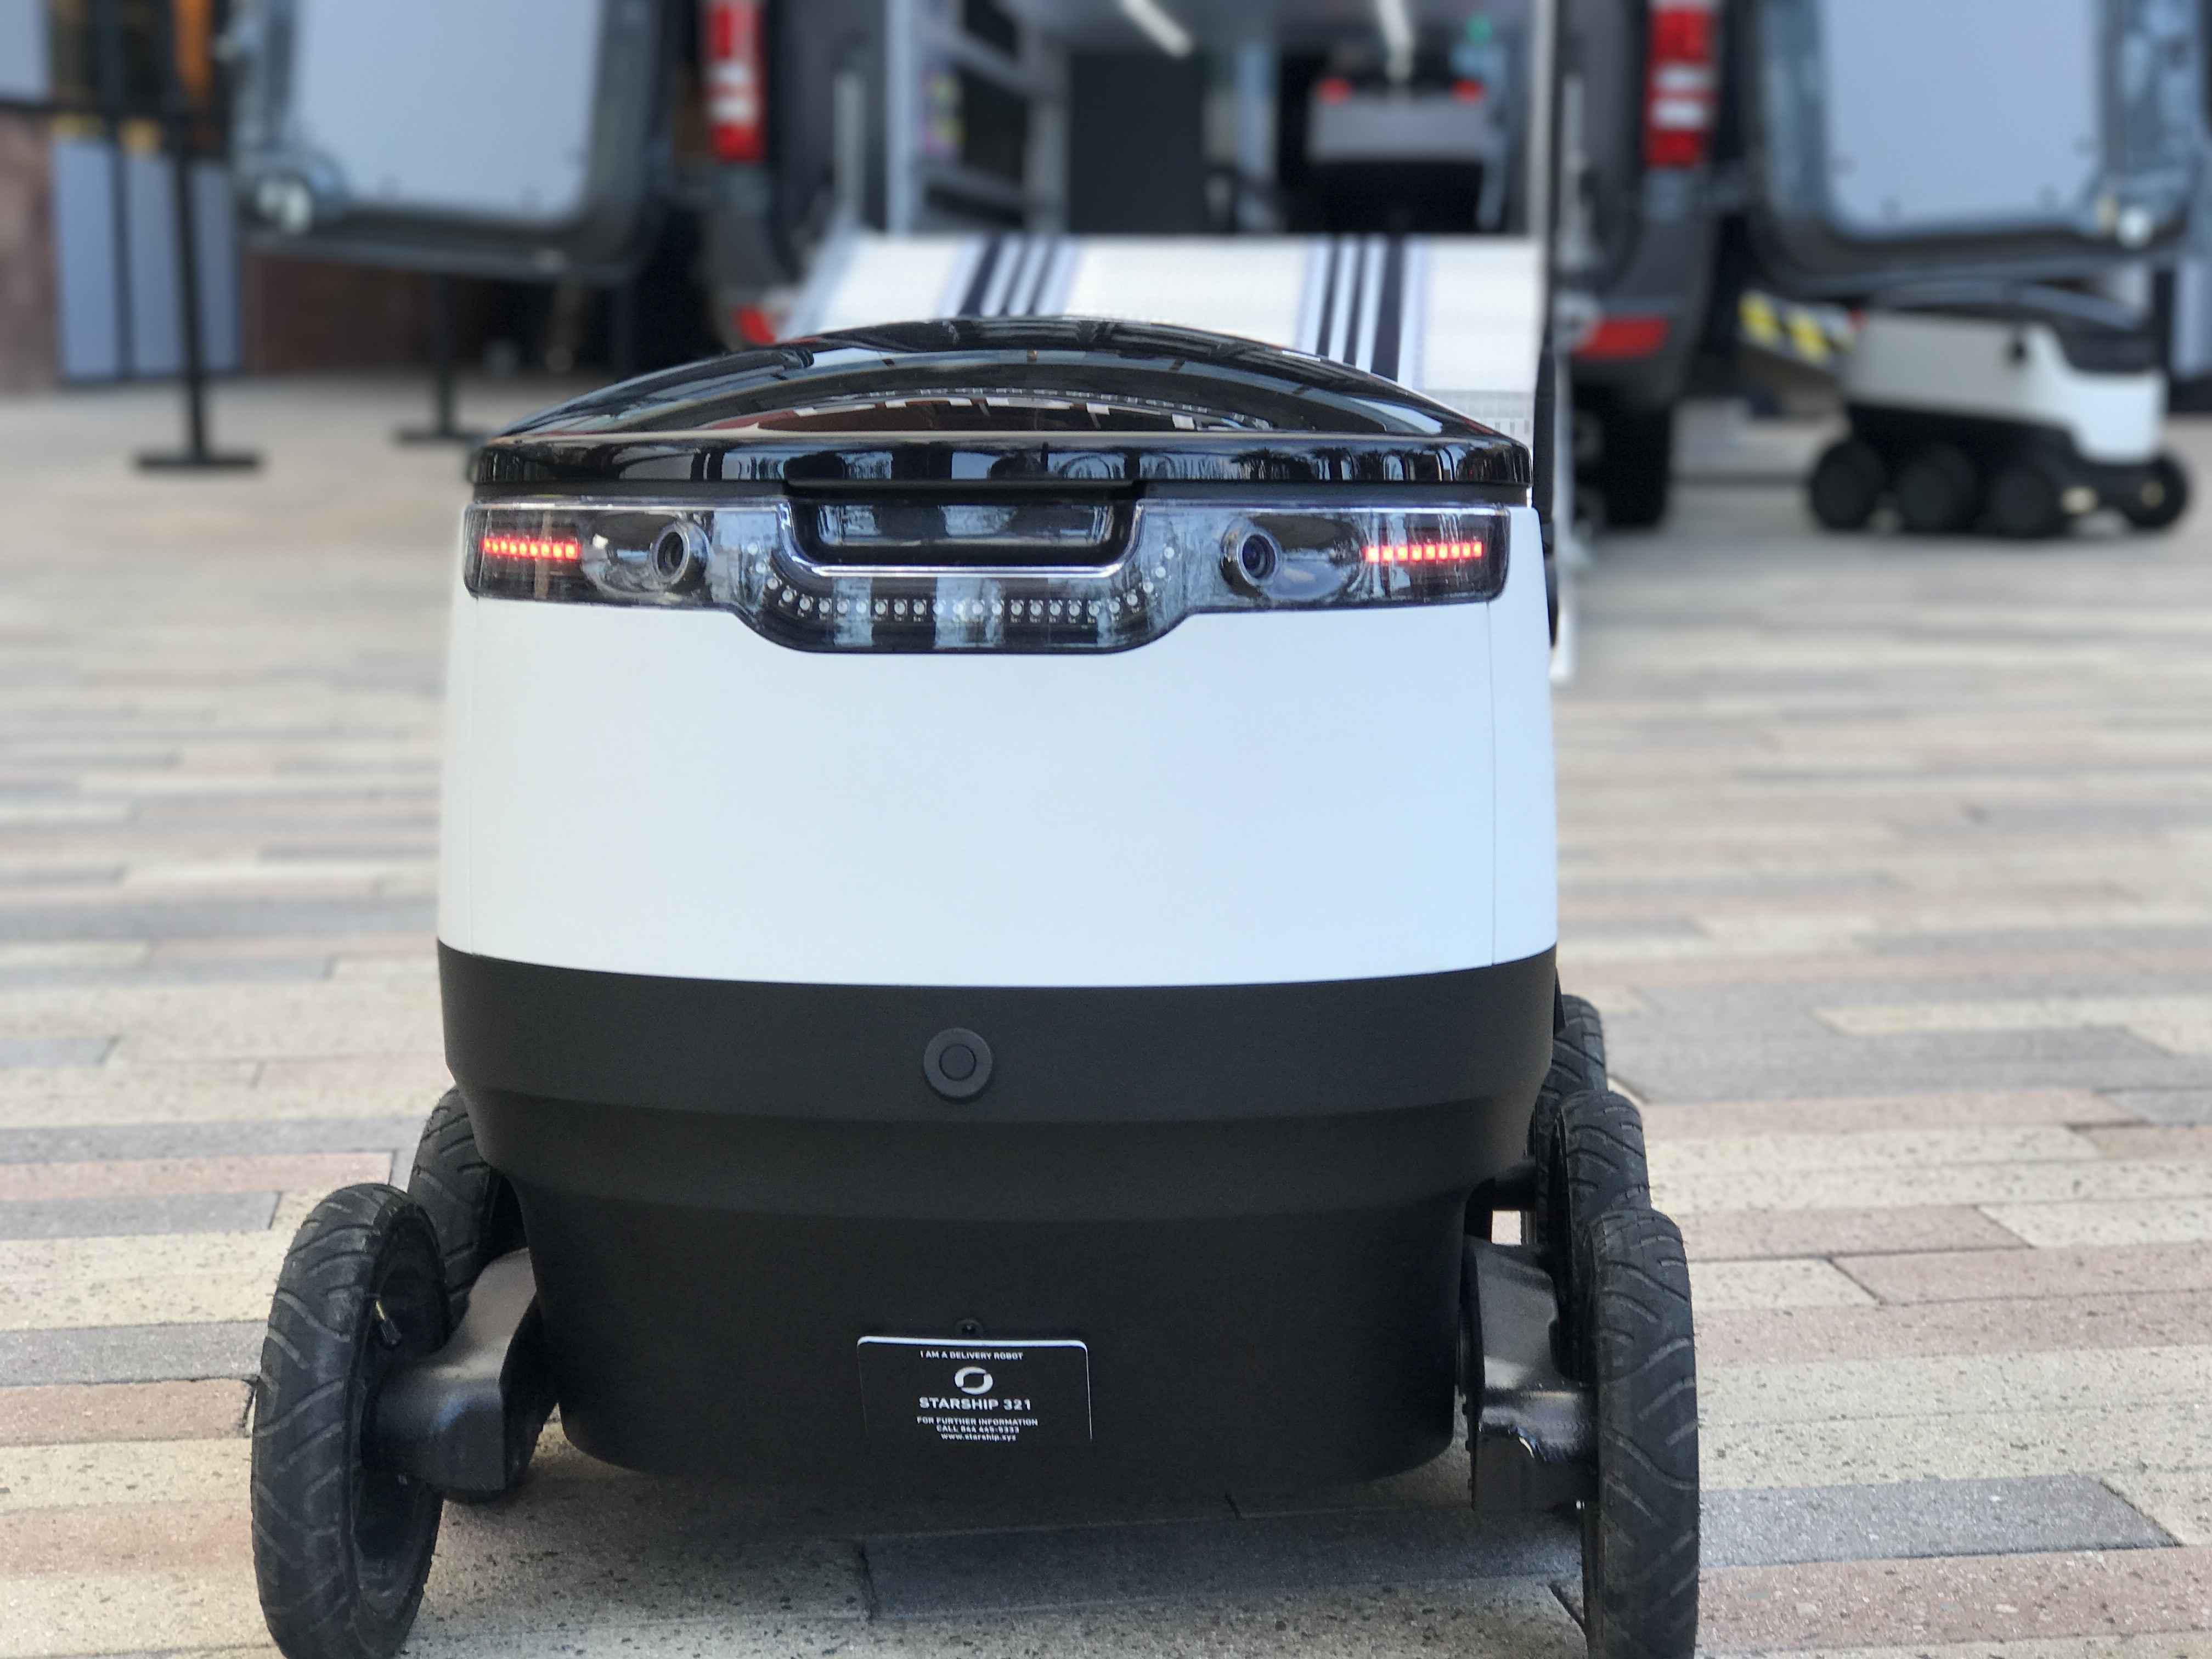 Mercedes-Benz Vans shares robotic delivery concept details